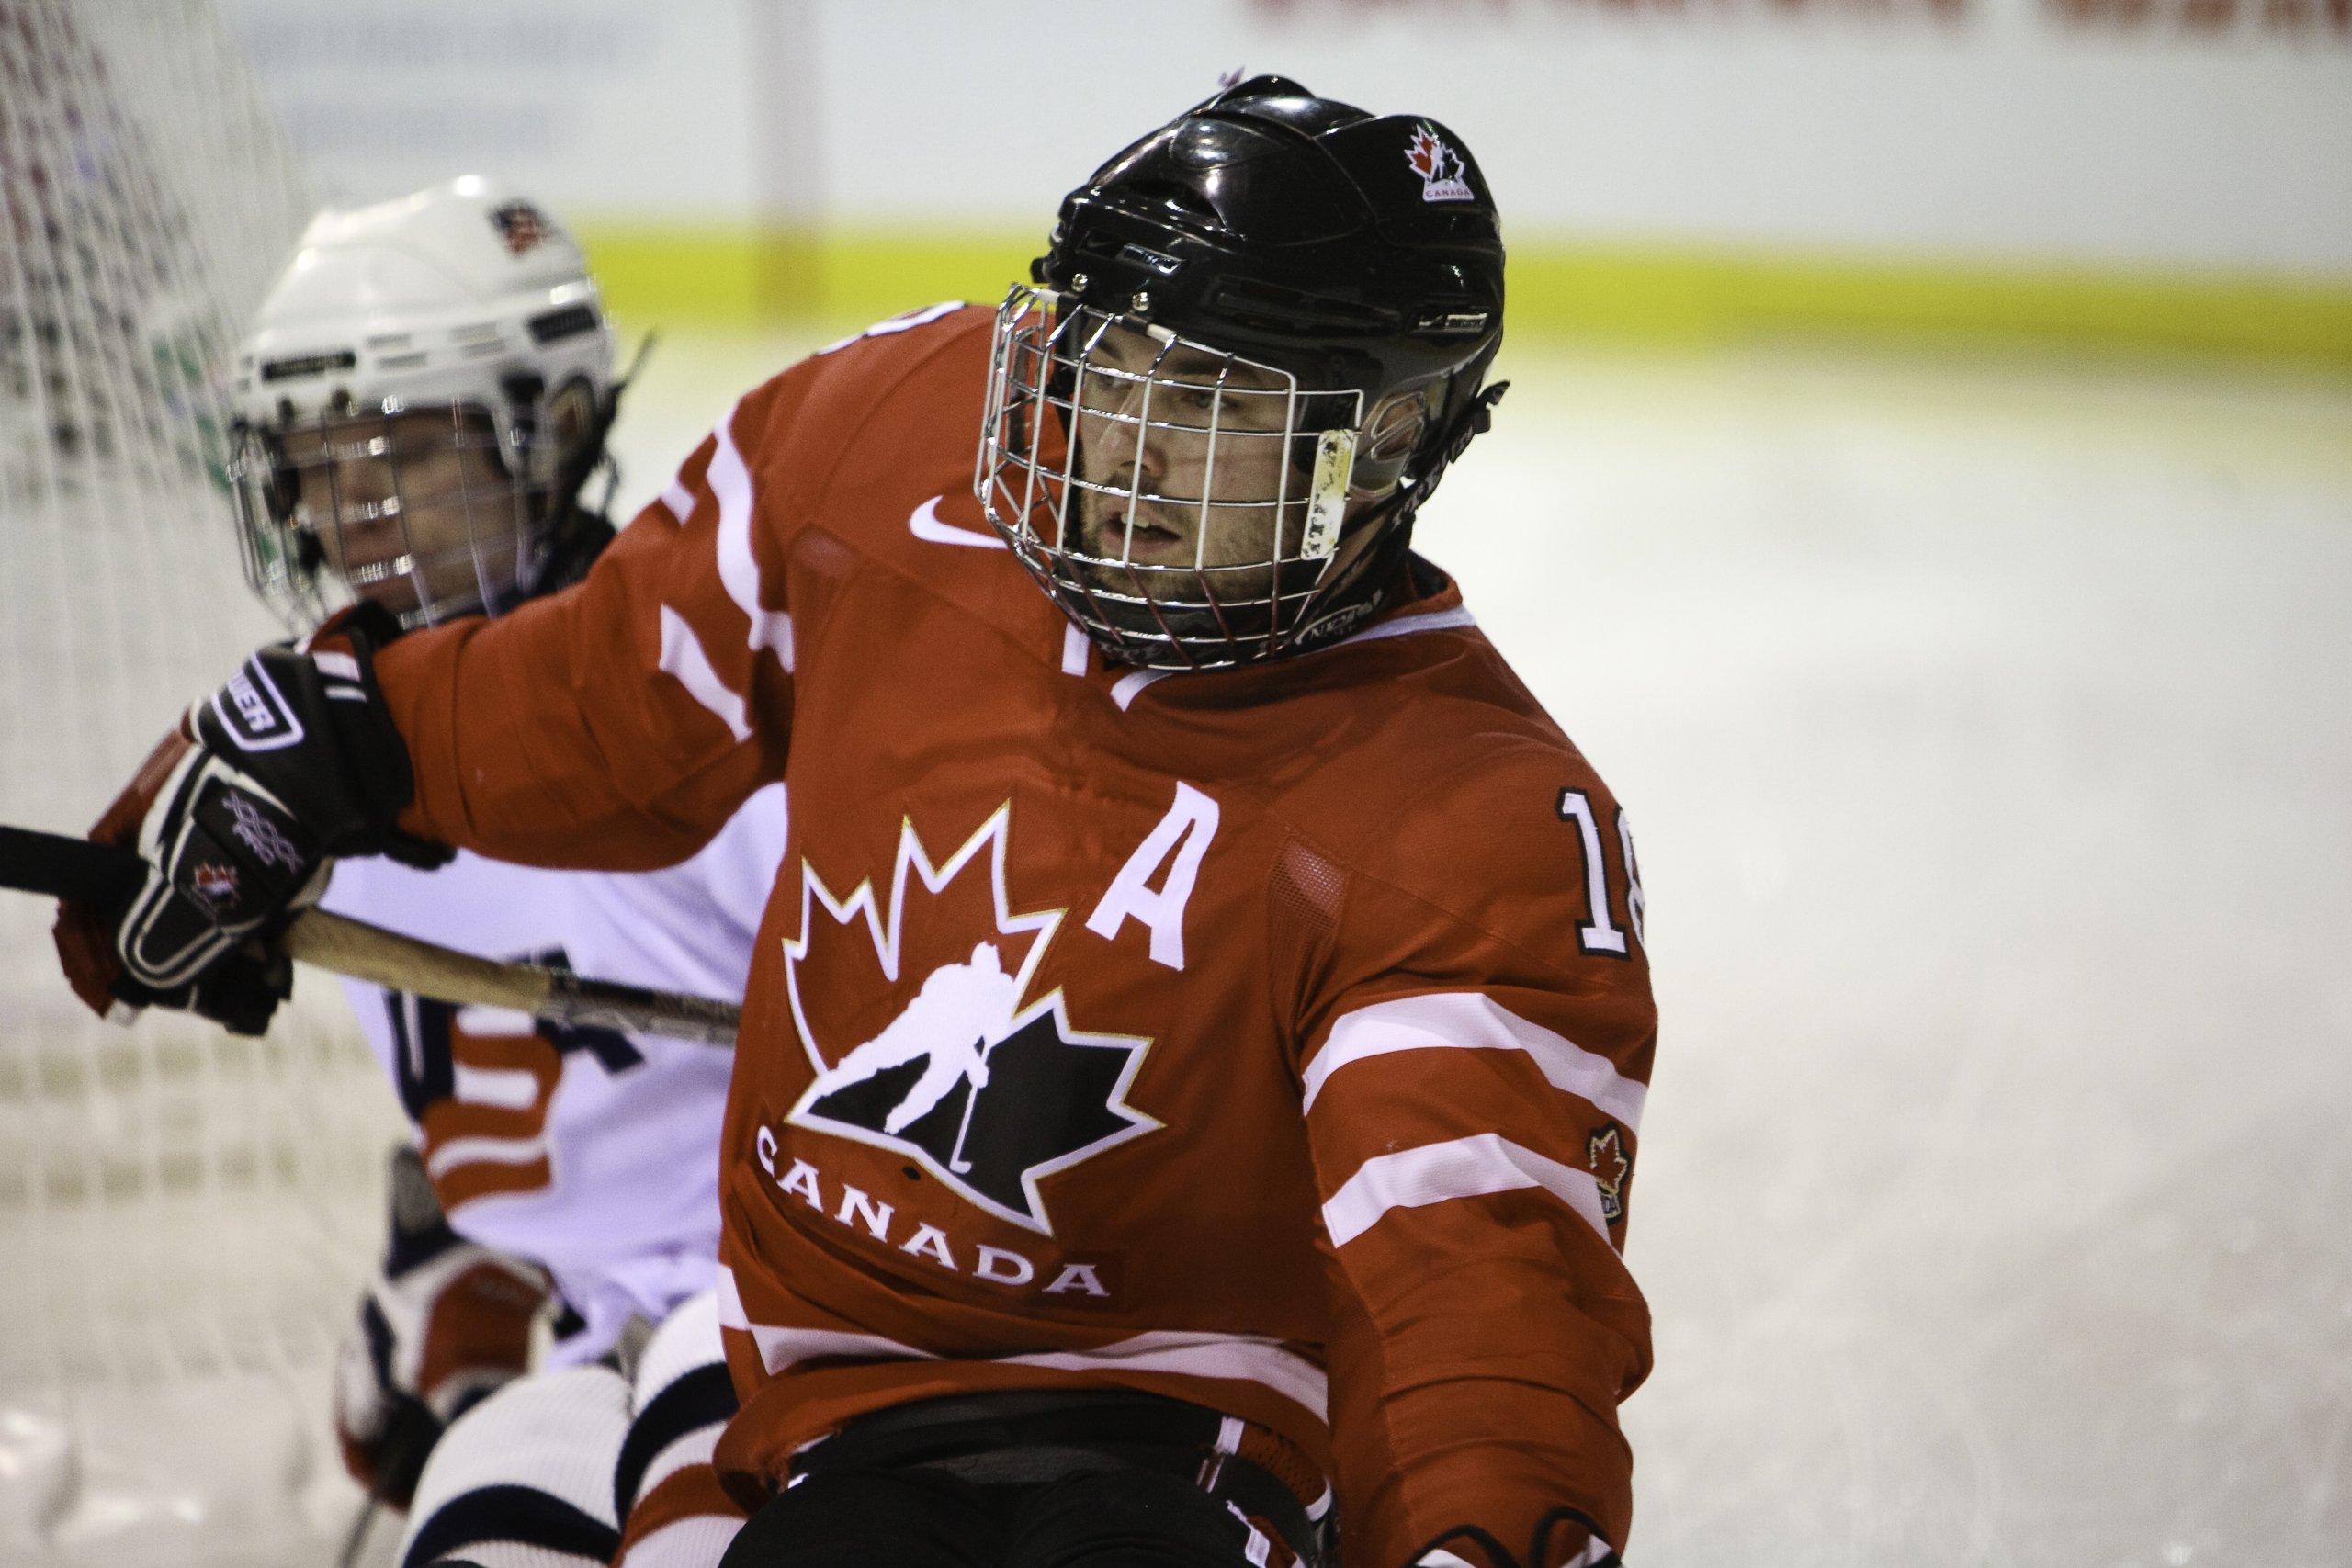 Kanada ist Eishockey-Olympiasieger